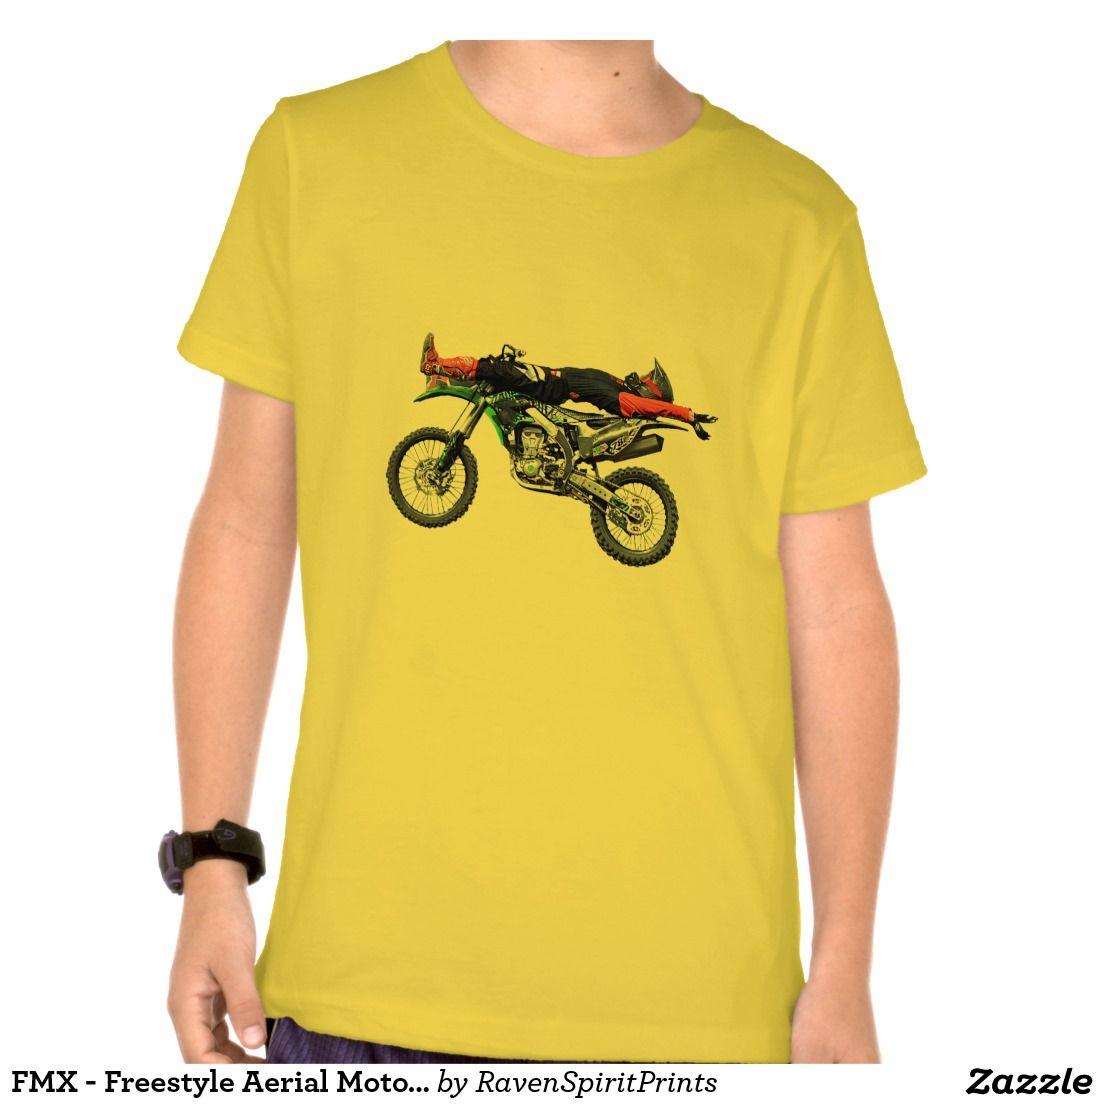 FMX - Freestyle Aerial Motocross Stunt III Tee Shirts